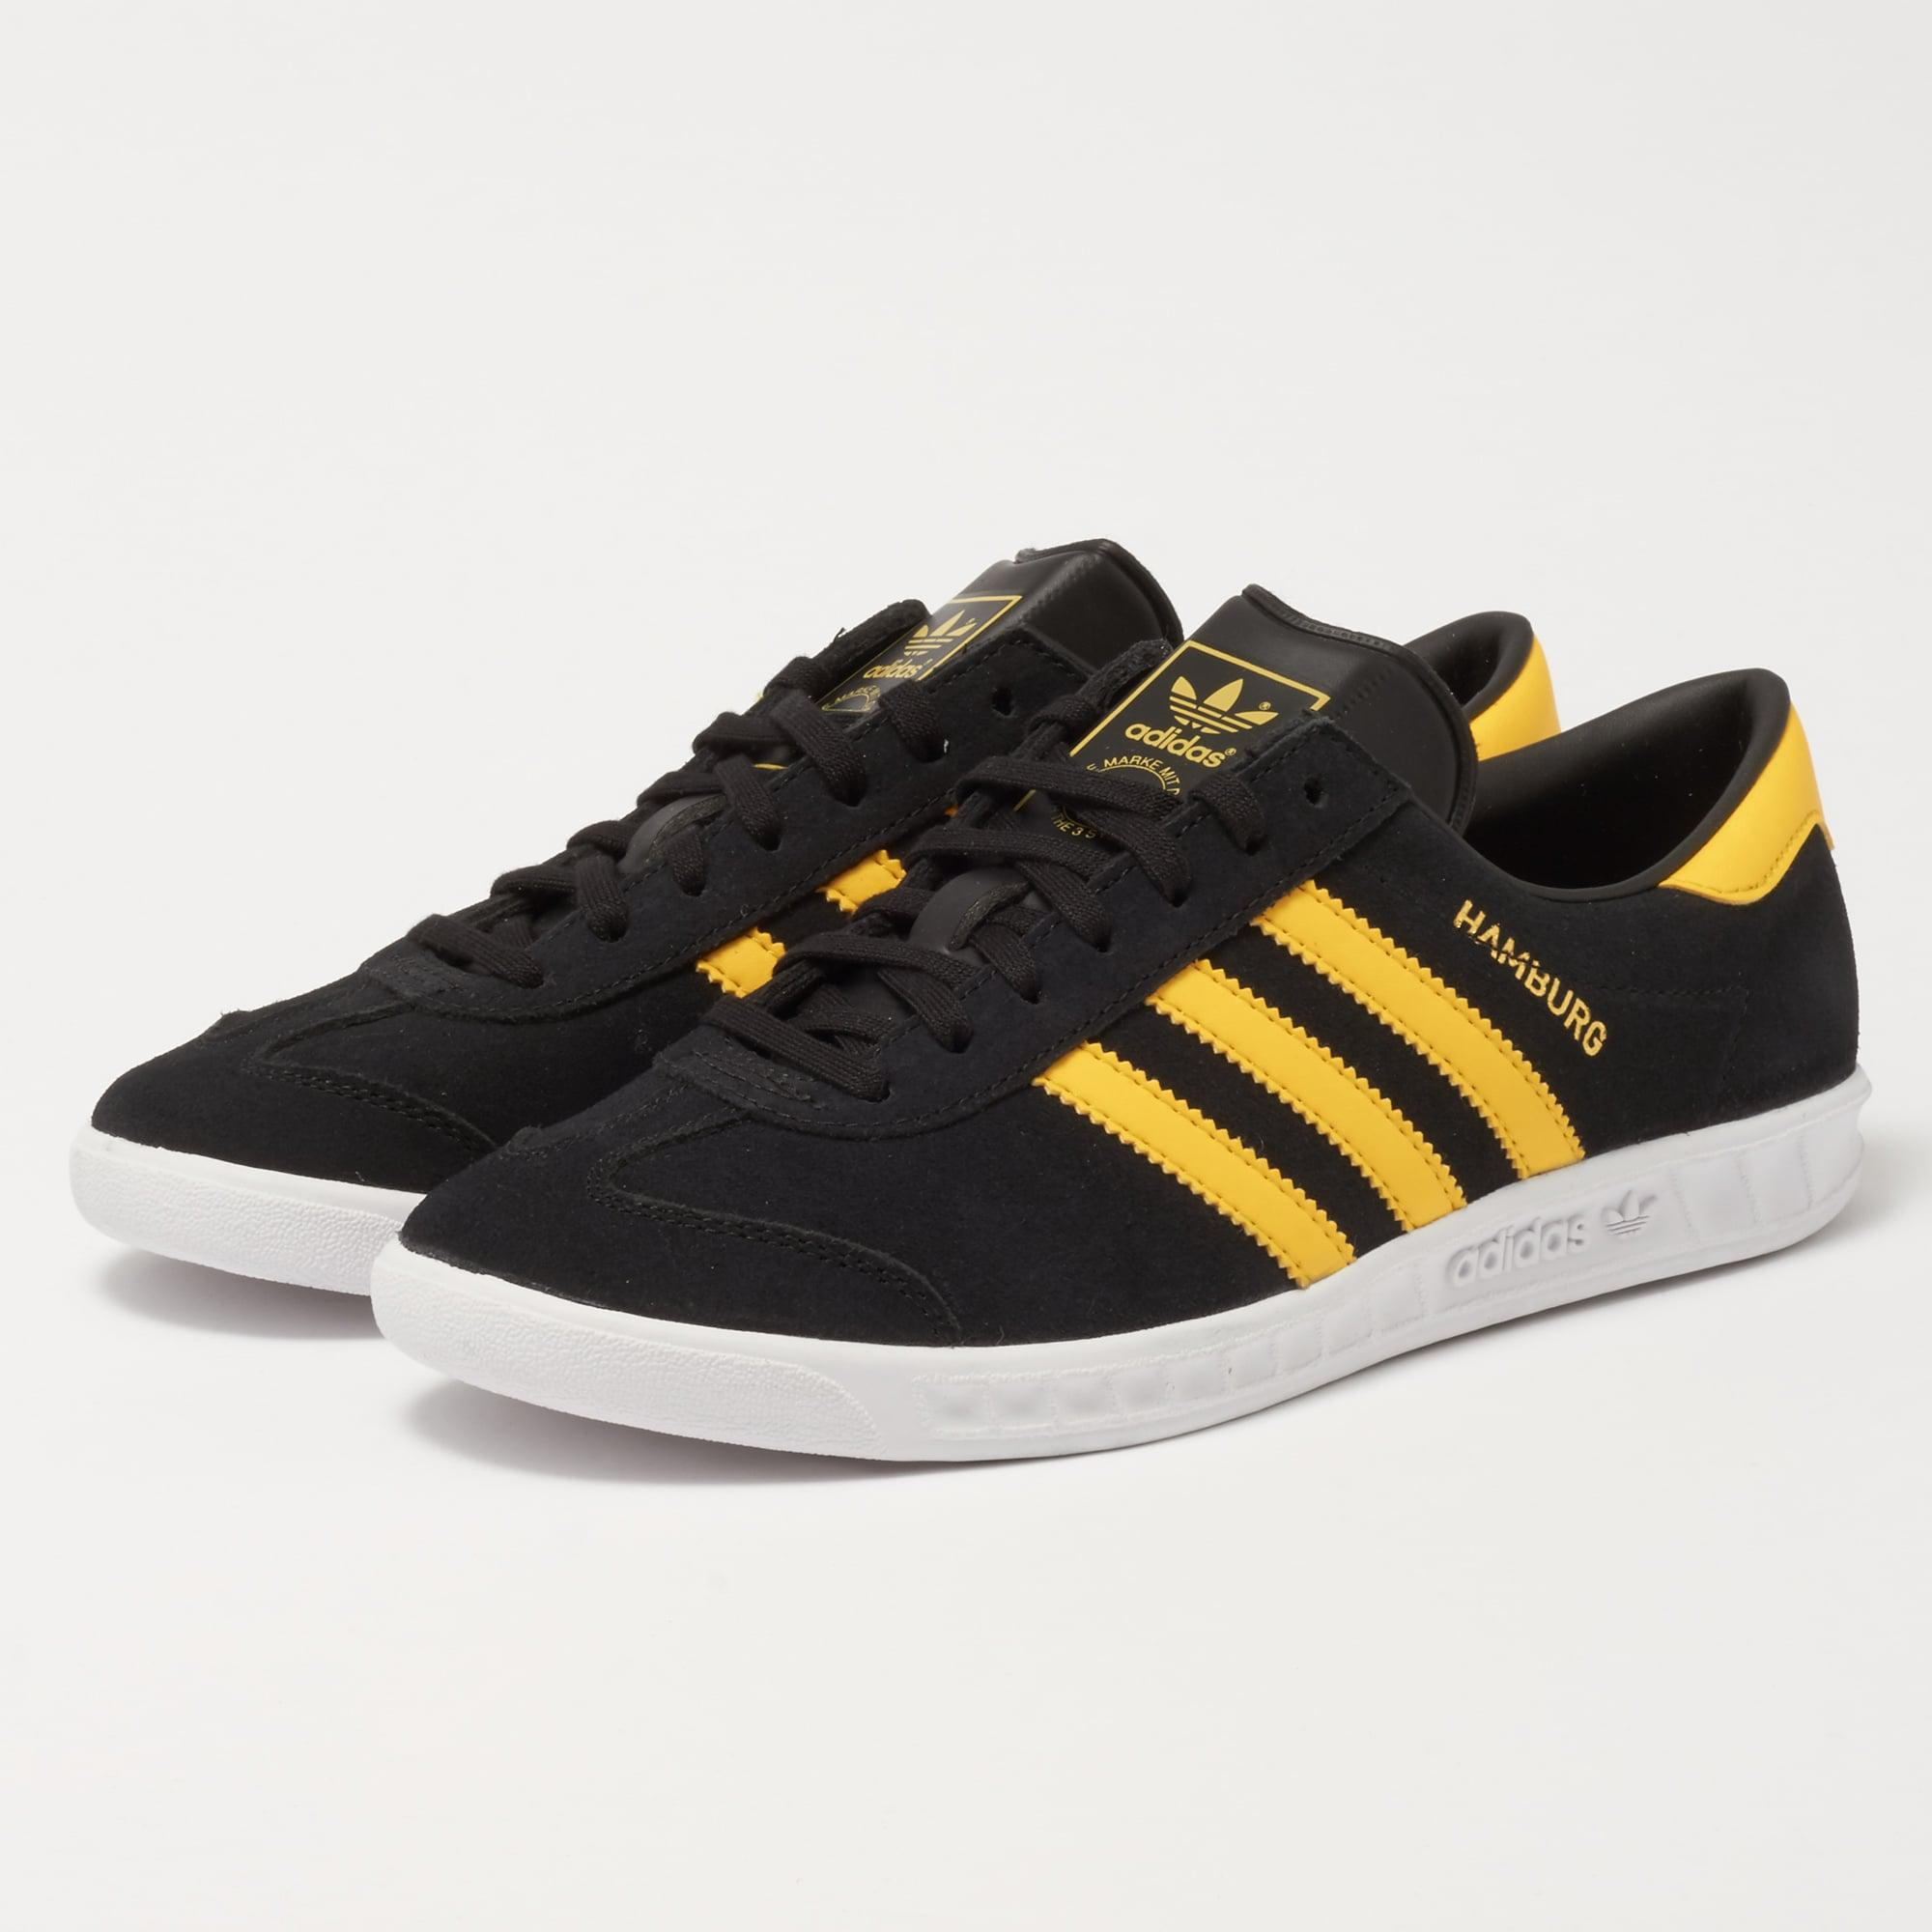 Lyst - adidas Originals Hamburg - Black   Yellow in Black for Men ed12829ff490e